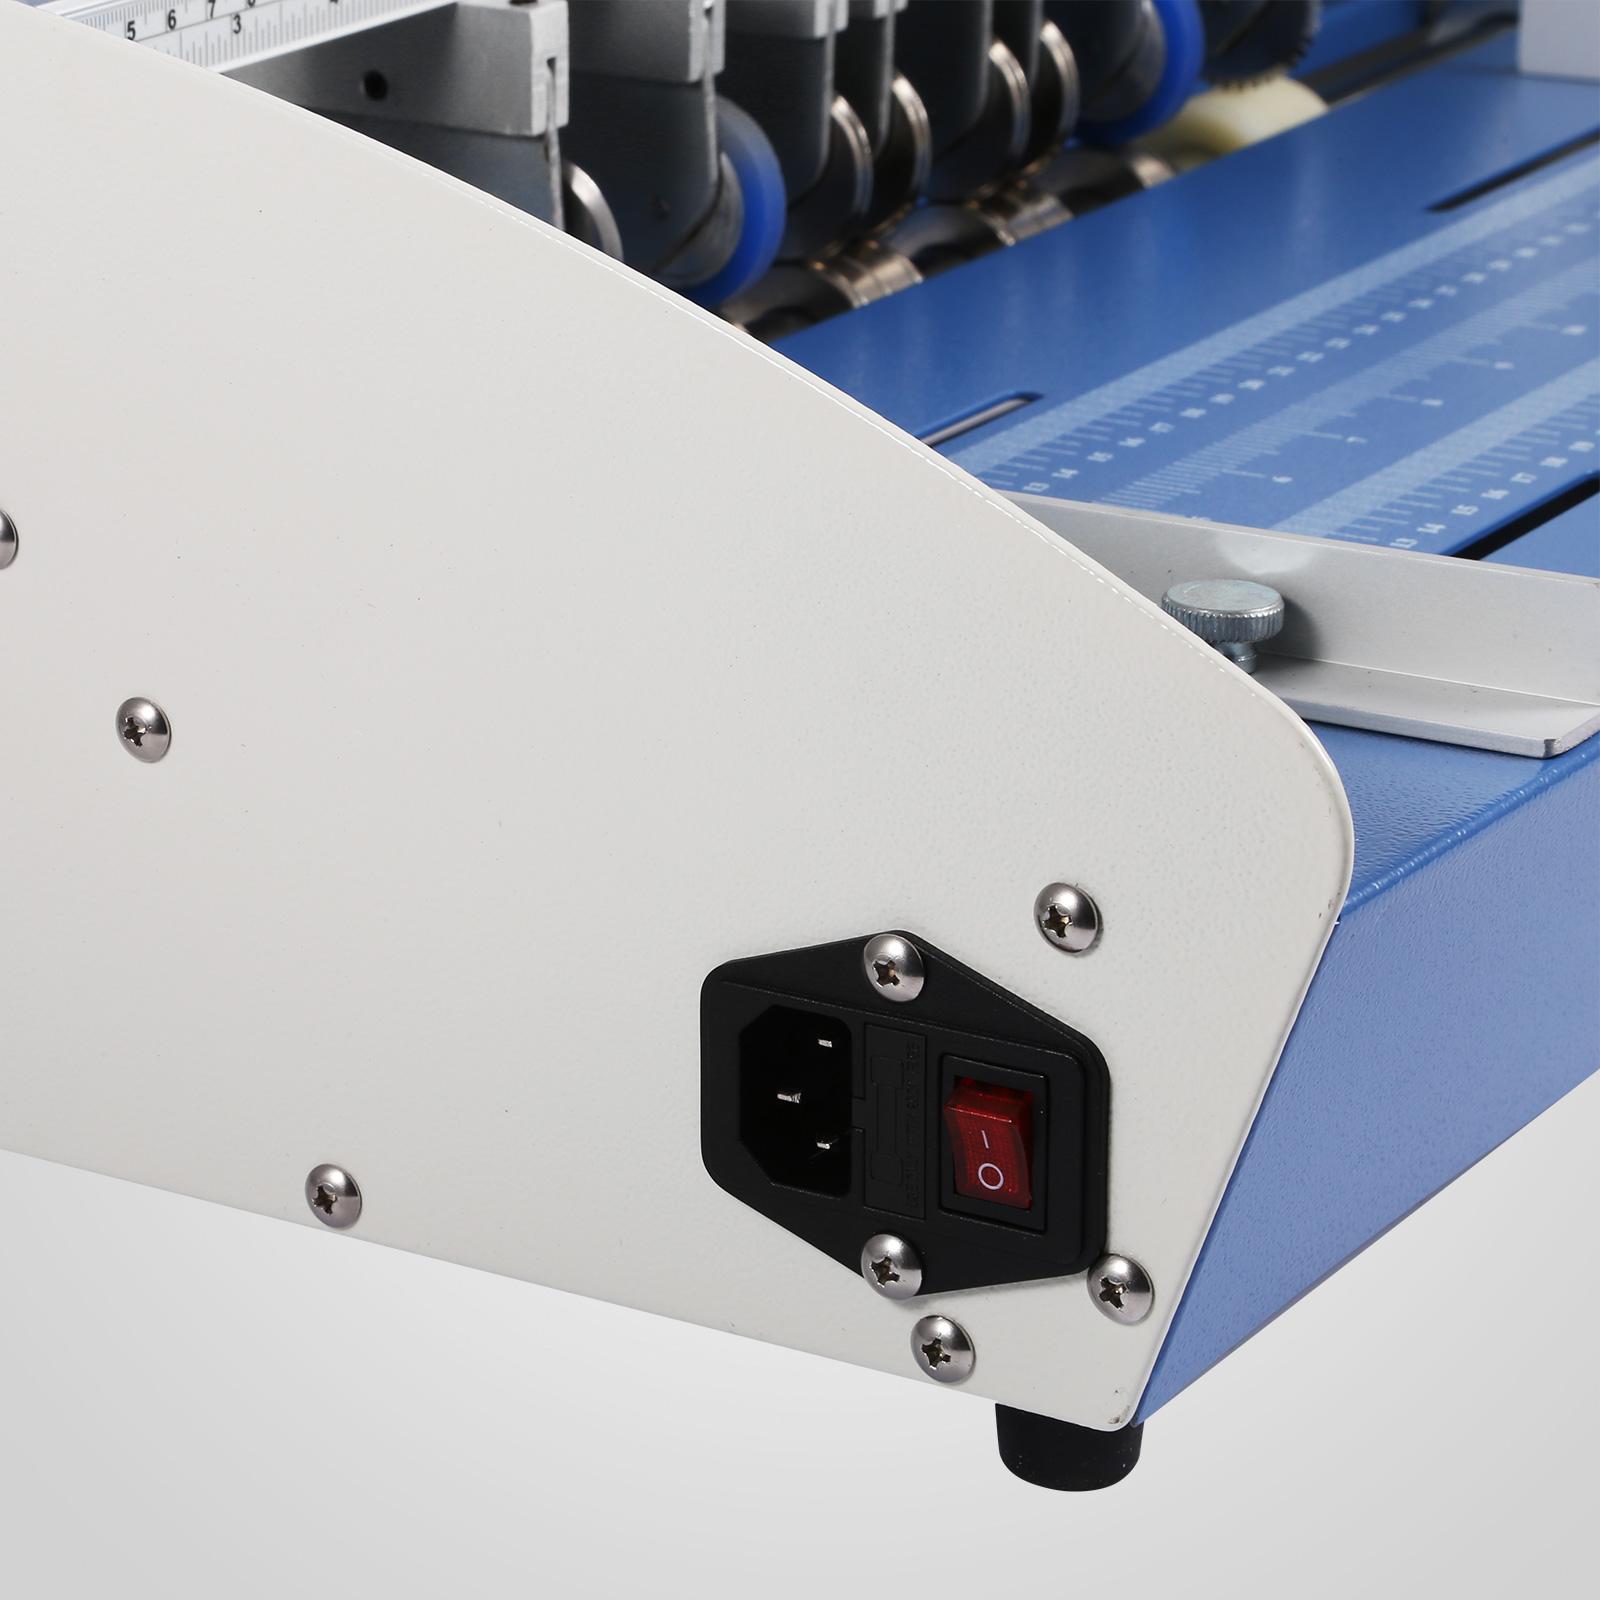 Cordonatrice-Perforatrice-Max-350-520mm-Profondita-Regolabile-Elettrica-Manuale miniatura 23